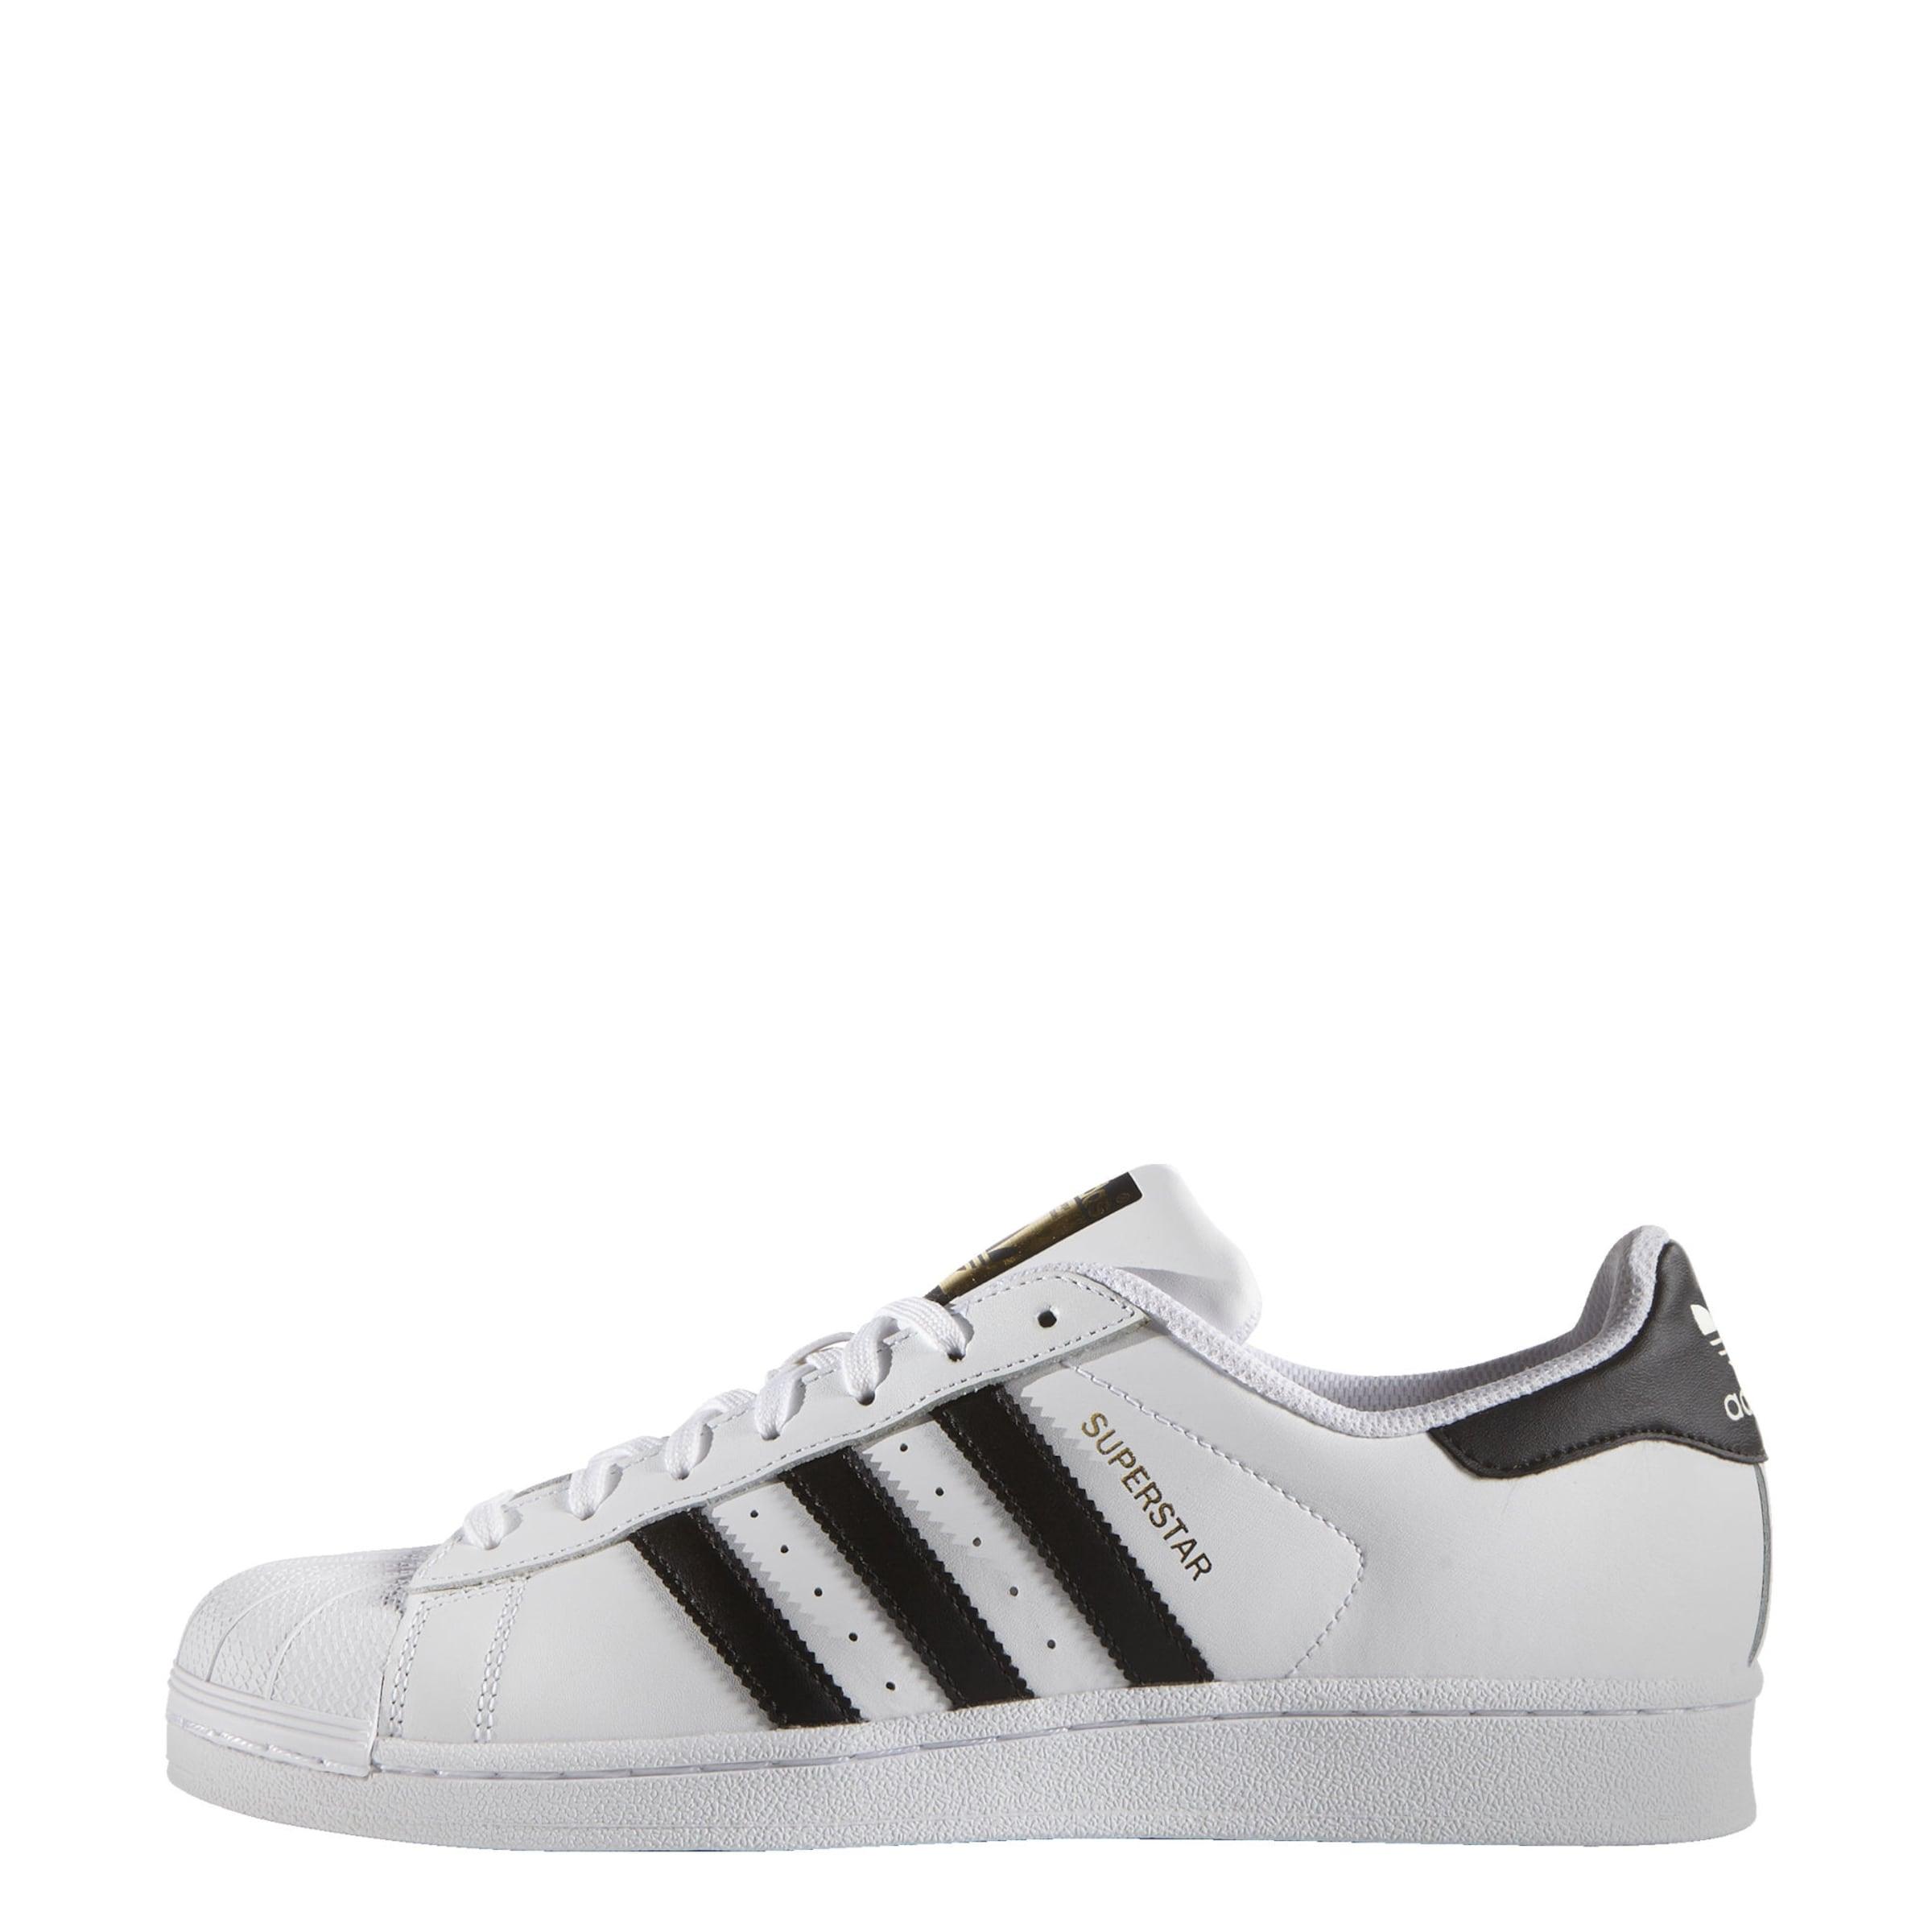 Adidas Originals 'superstar 'superstar Originals Adidas Turnschuhe Turnschuhe Bequem zMVGLqSUp